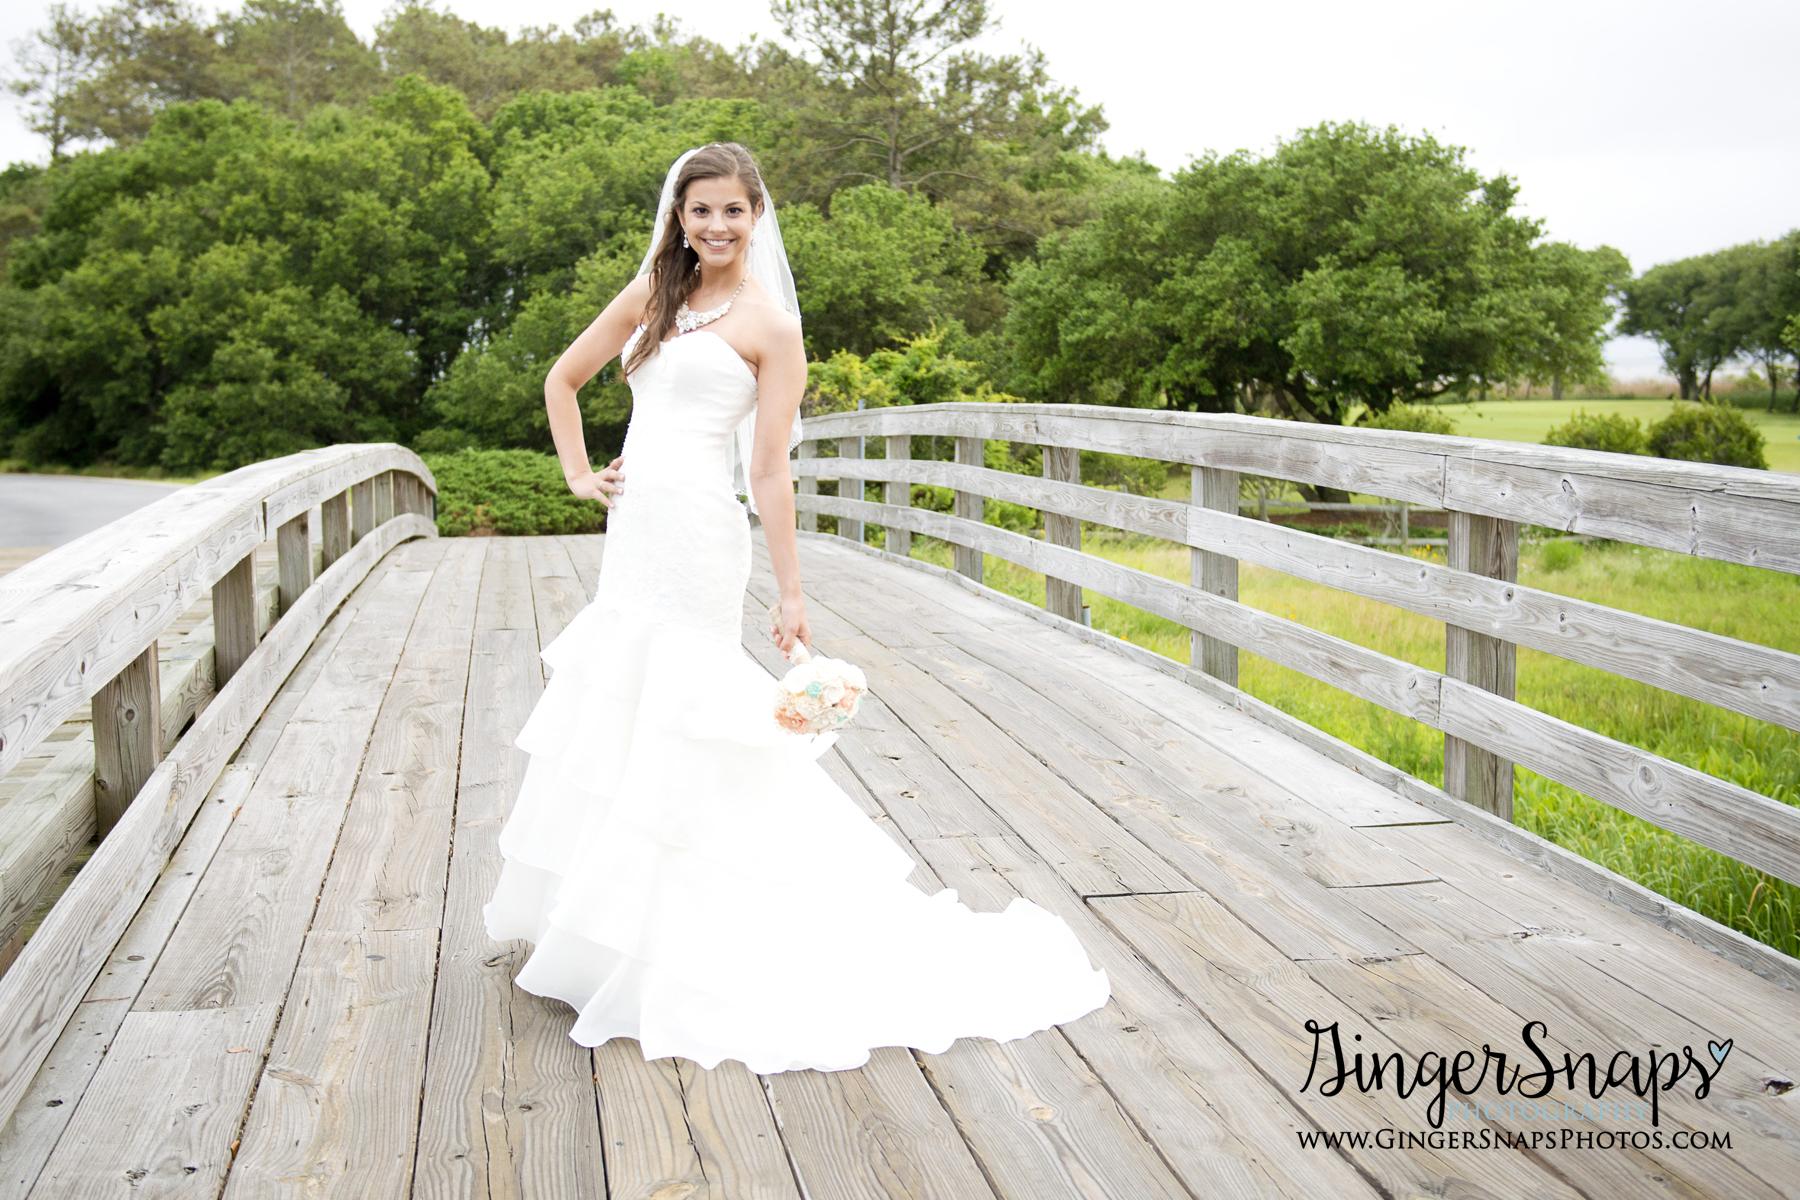 GingerSnaps Photography - 48.jpg